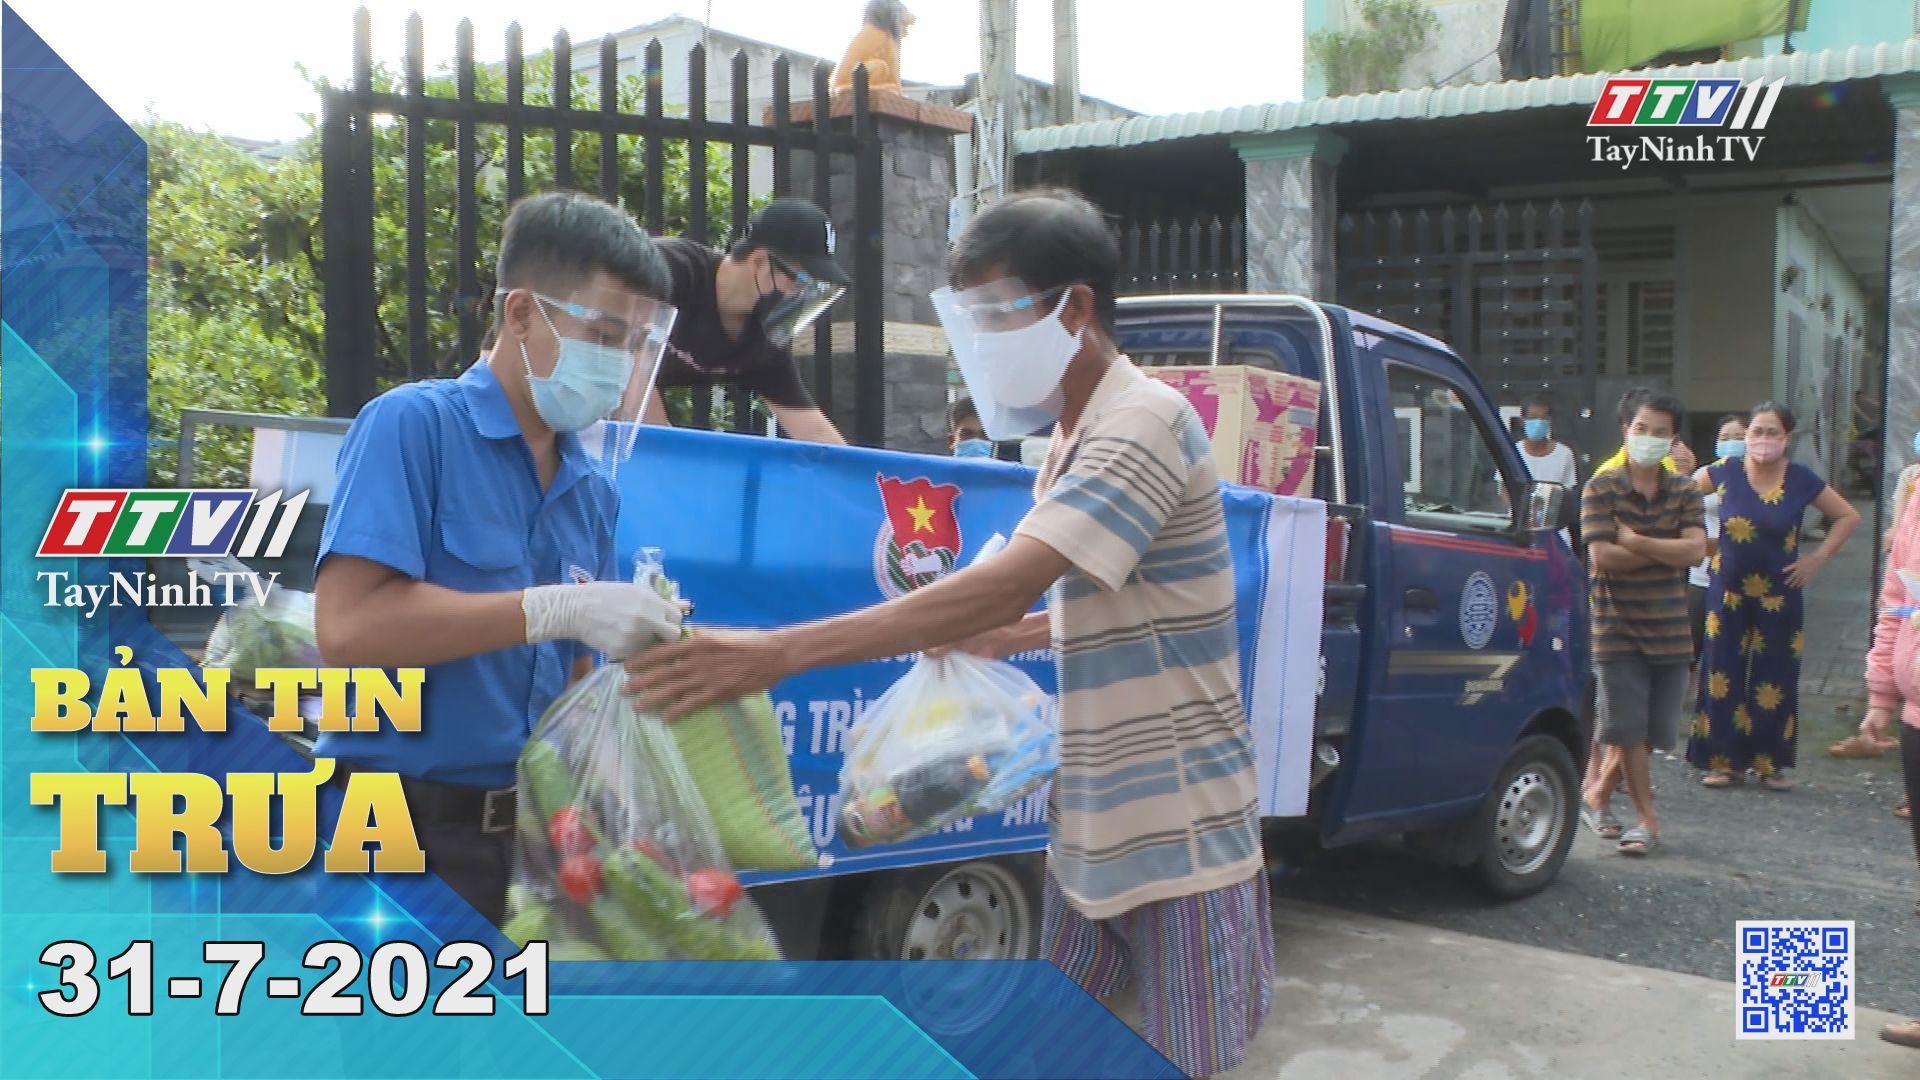 Bản tin trưa 31-7-2021 | Tin tức hôm nay | TayNinhTV